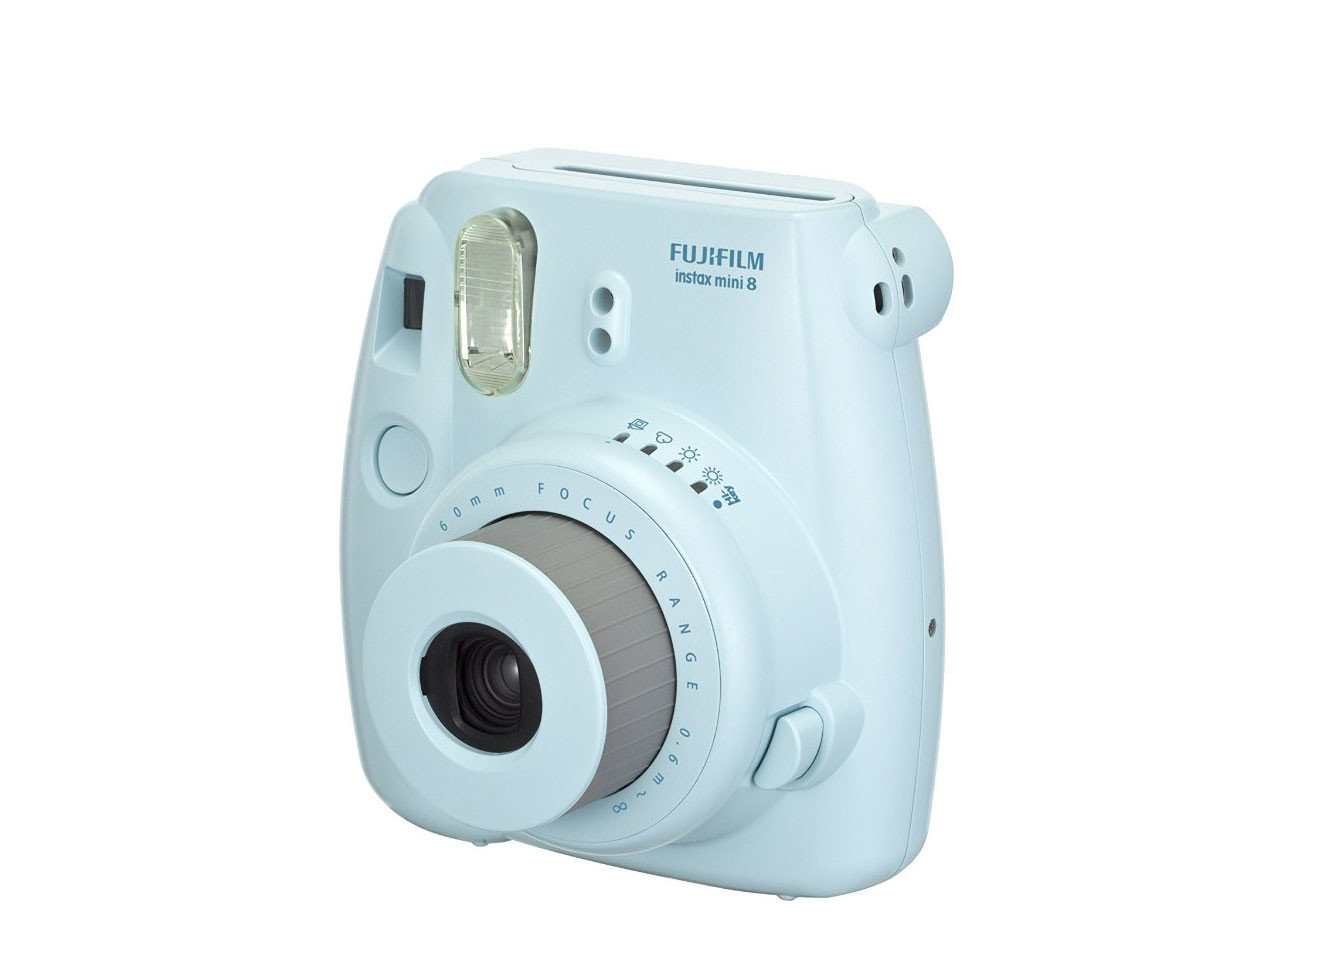 Style + Design camera digital camera cameras & optics product instant camera